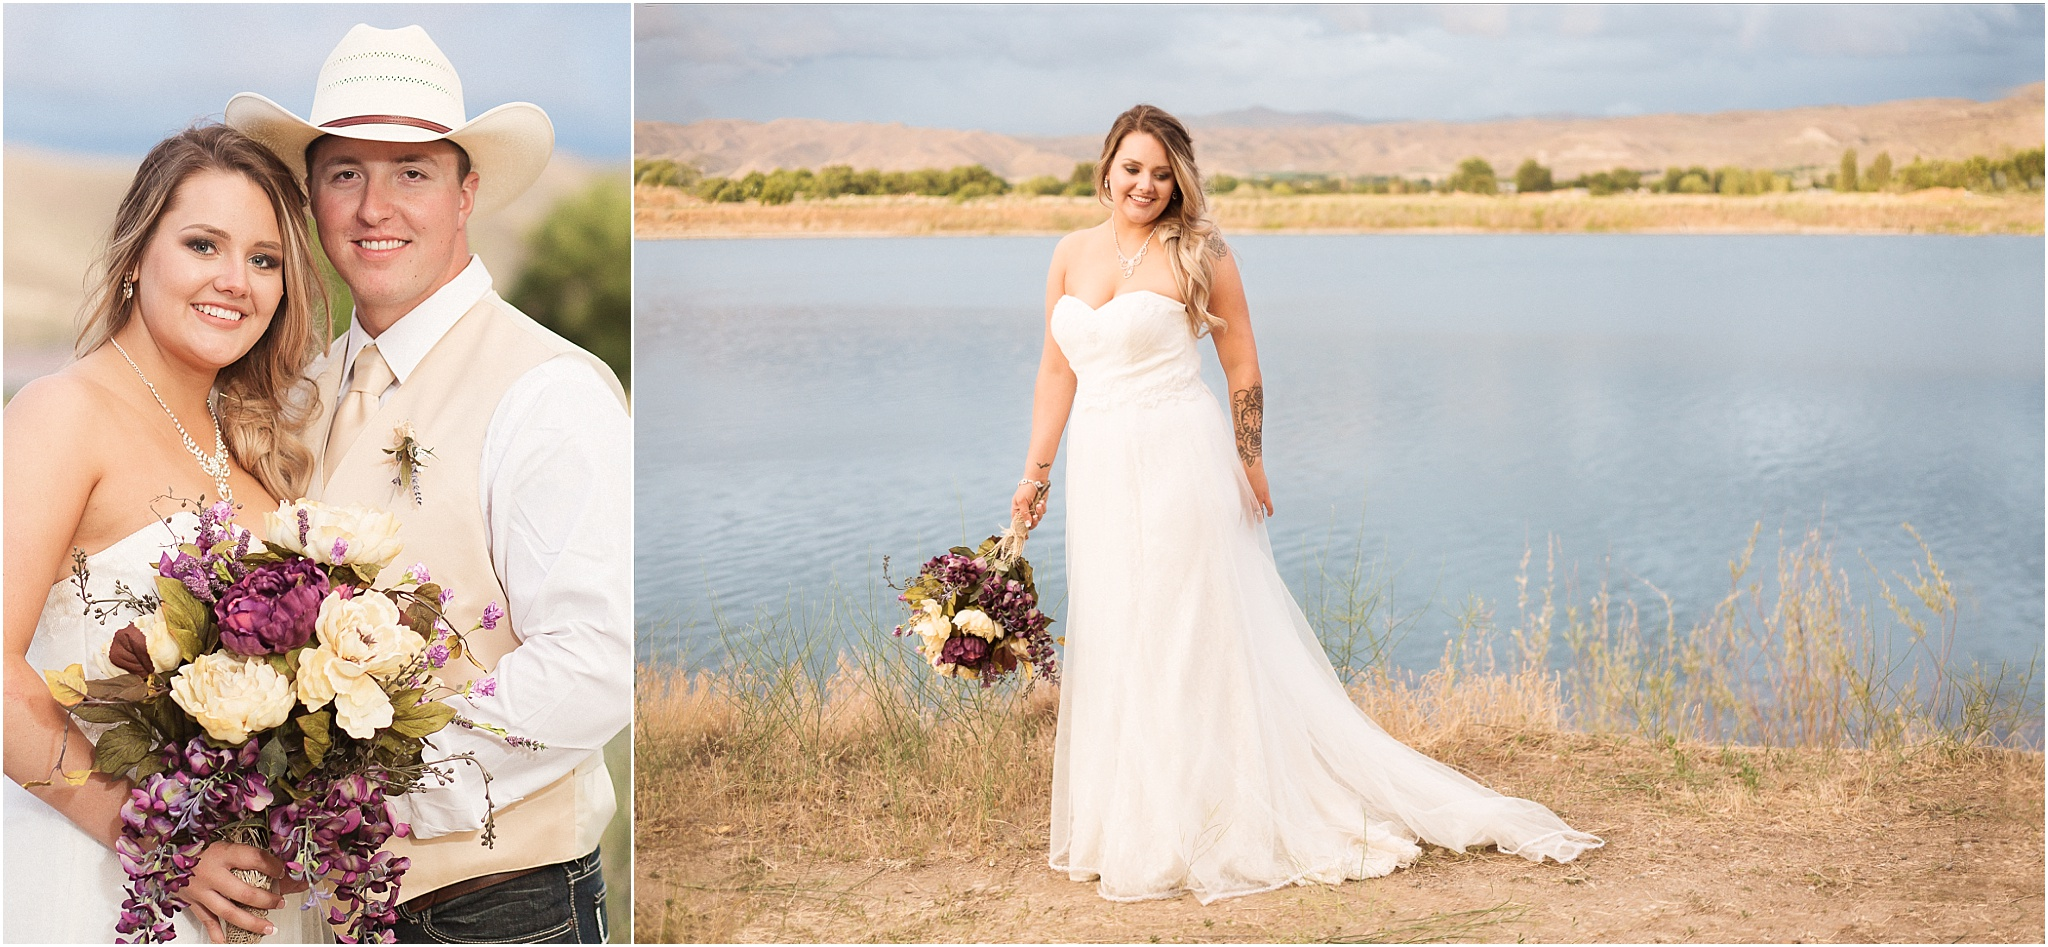 Wedding Photography_Emmett Idaho_Boise Idaho_Leah Southwick Photography_0048.jpg